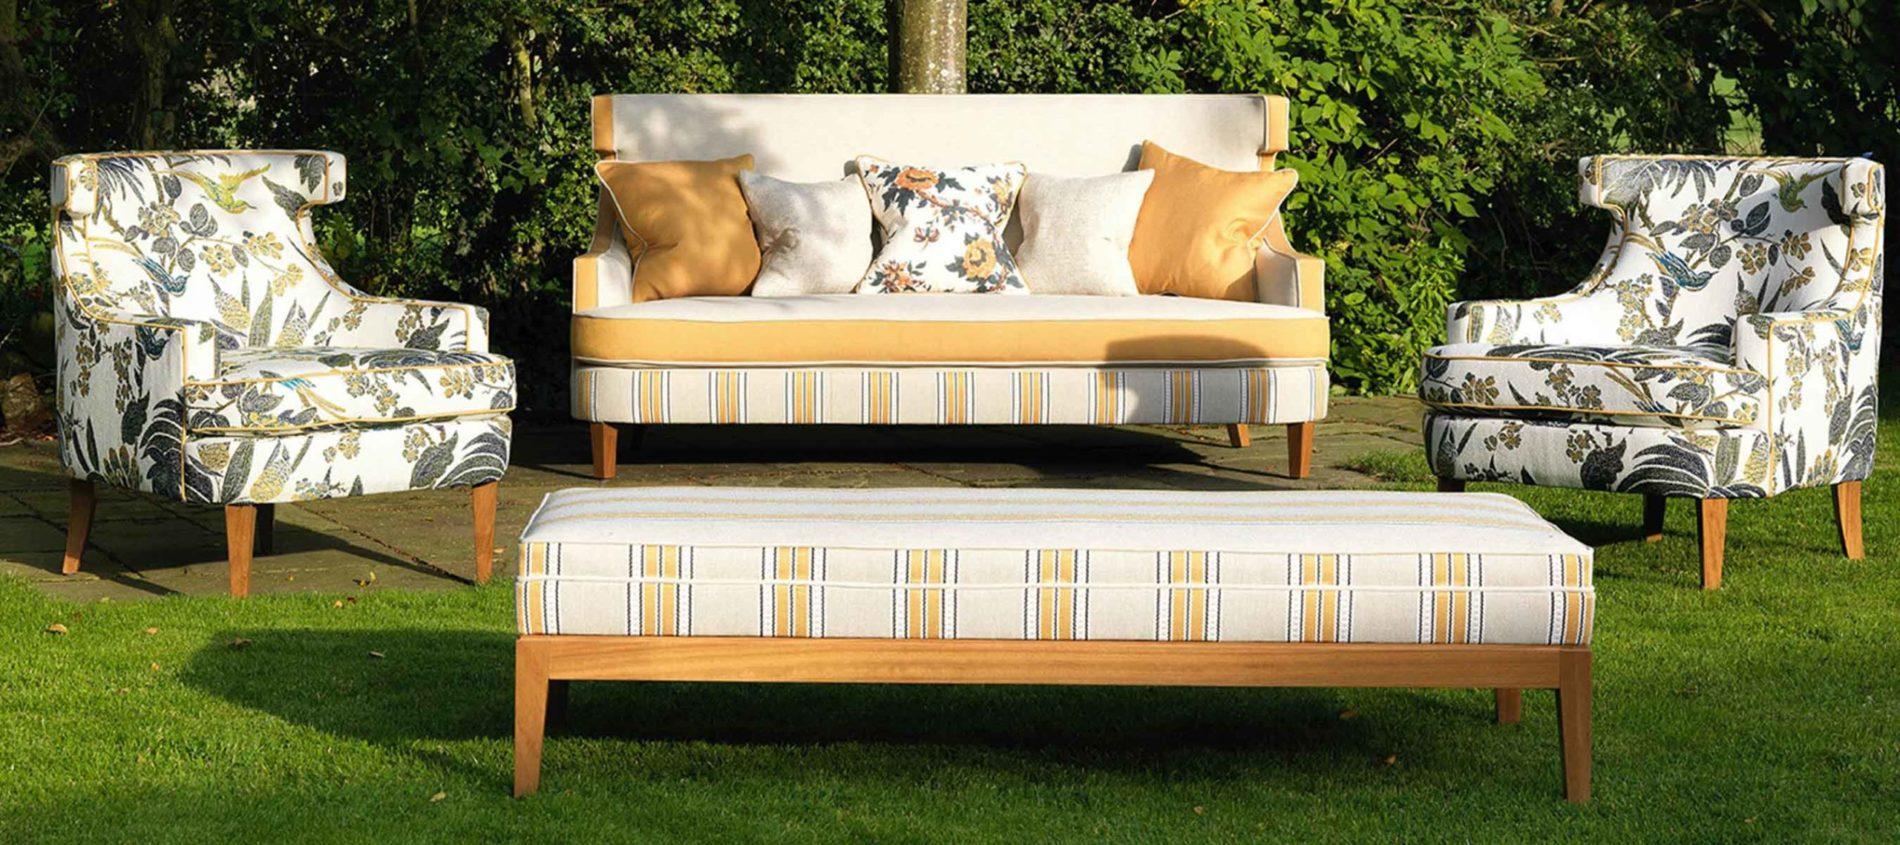 George Smith Furniture, Australia